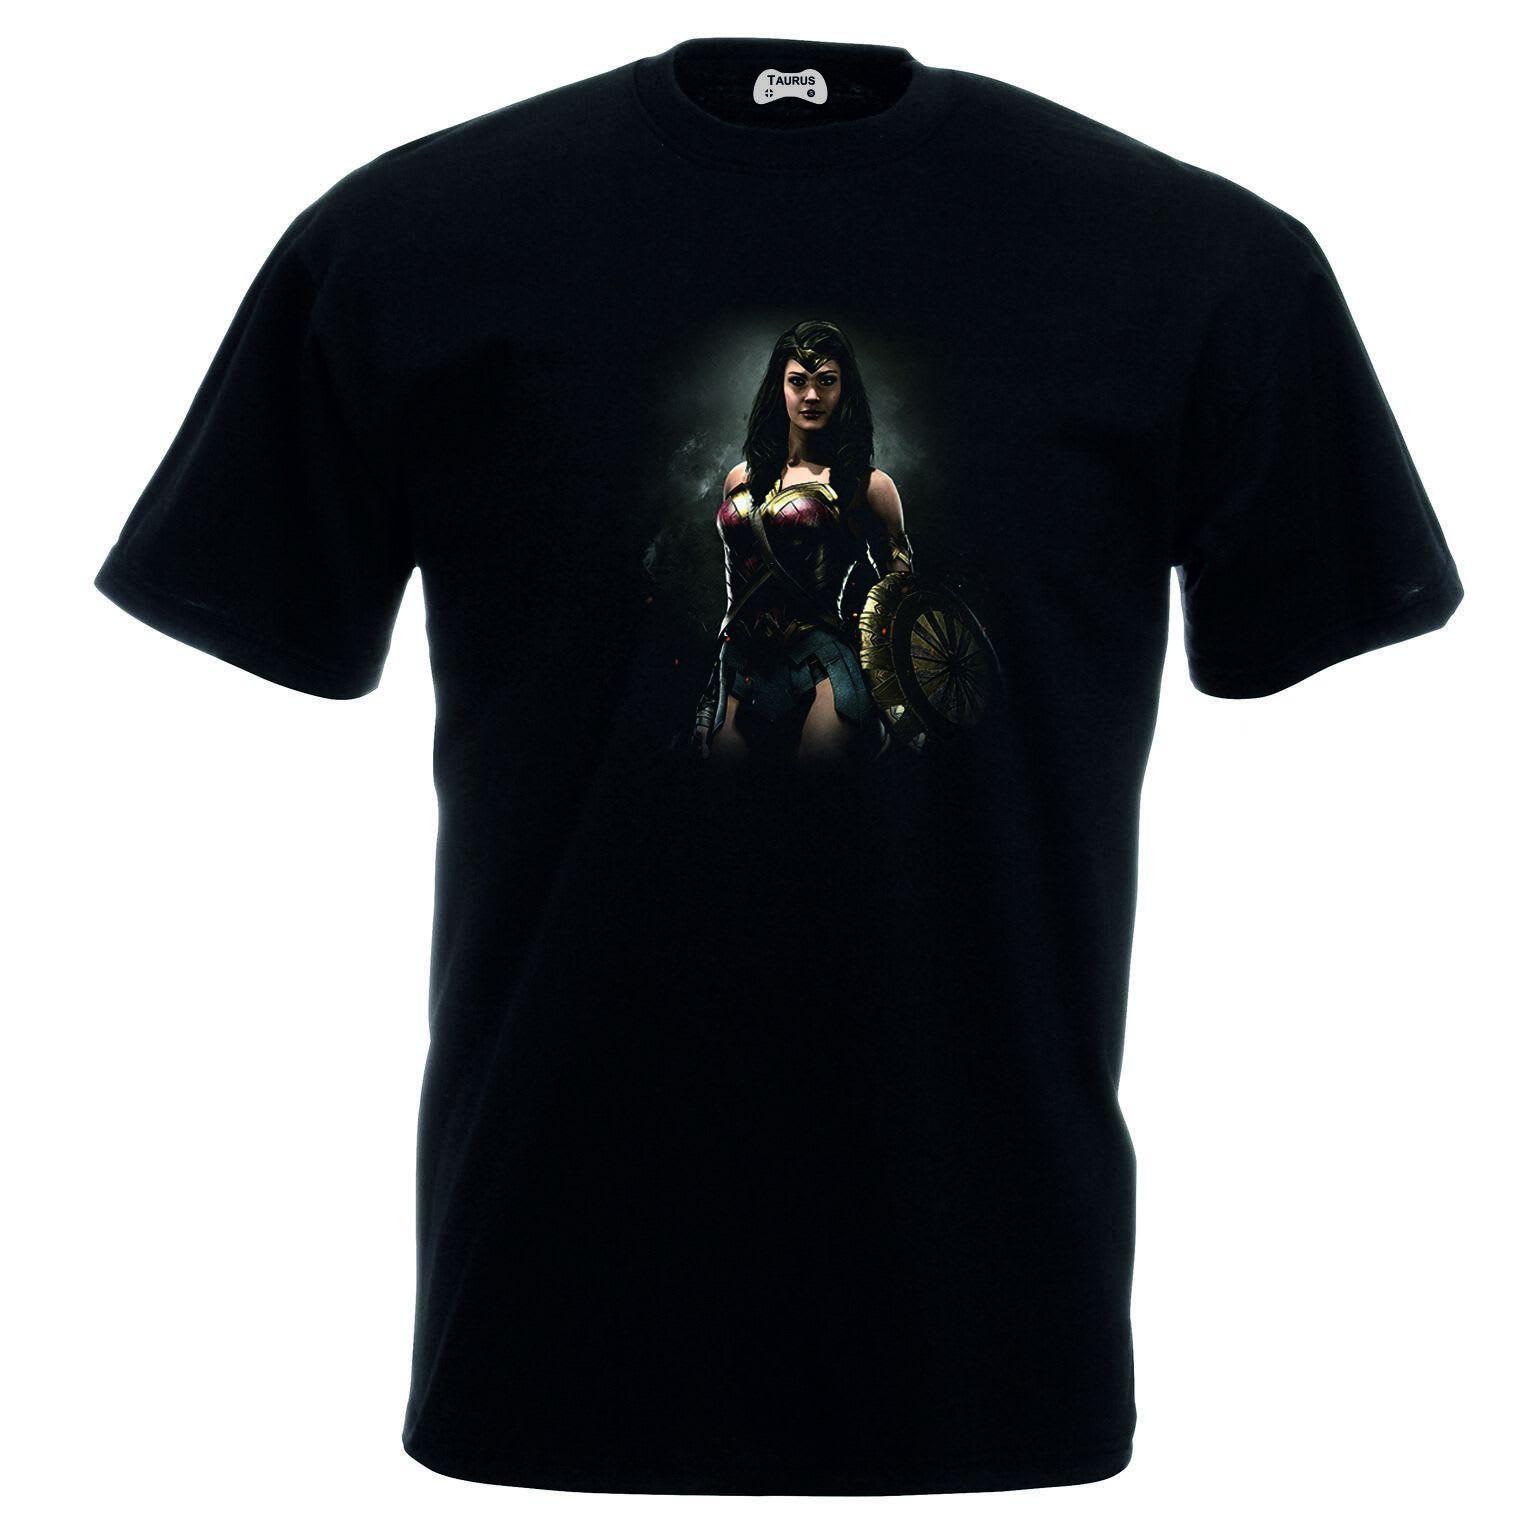 Injustice 2 T-Shirt Wonder Woman